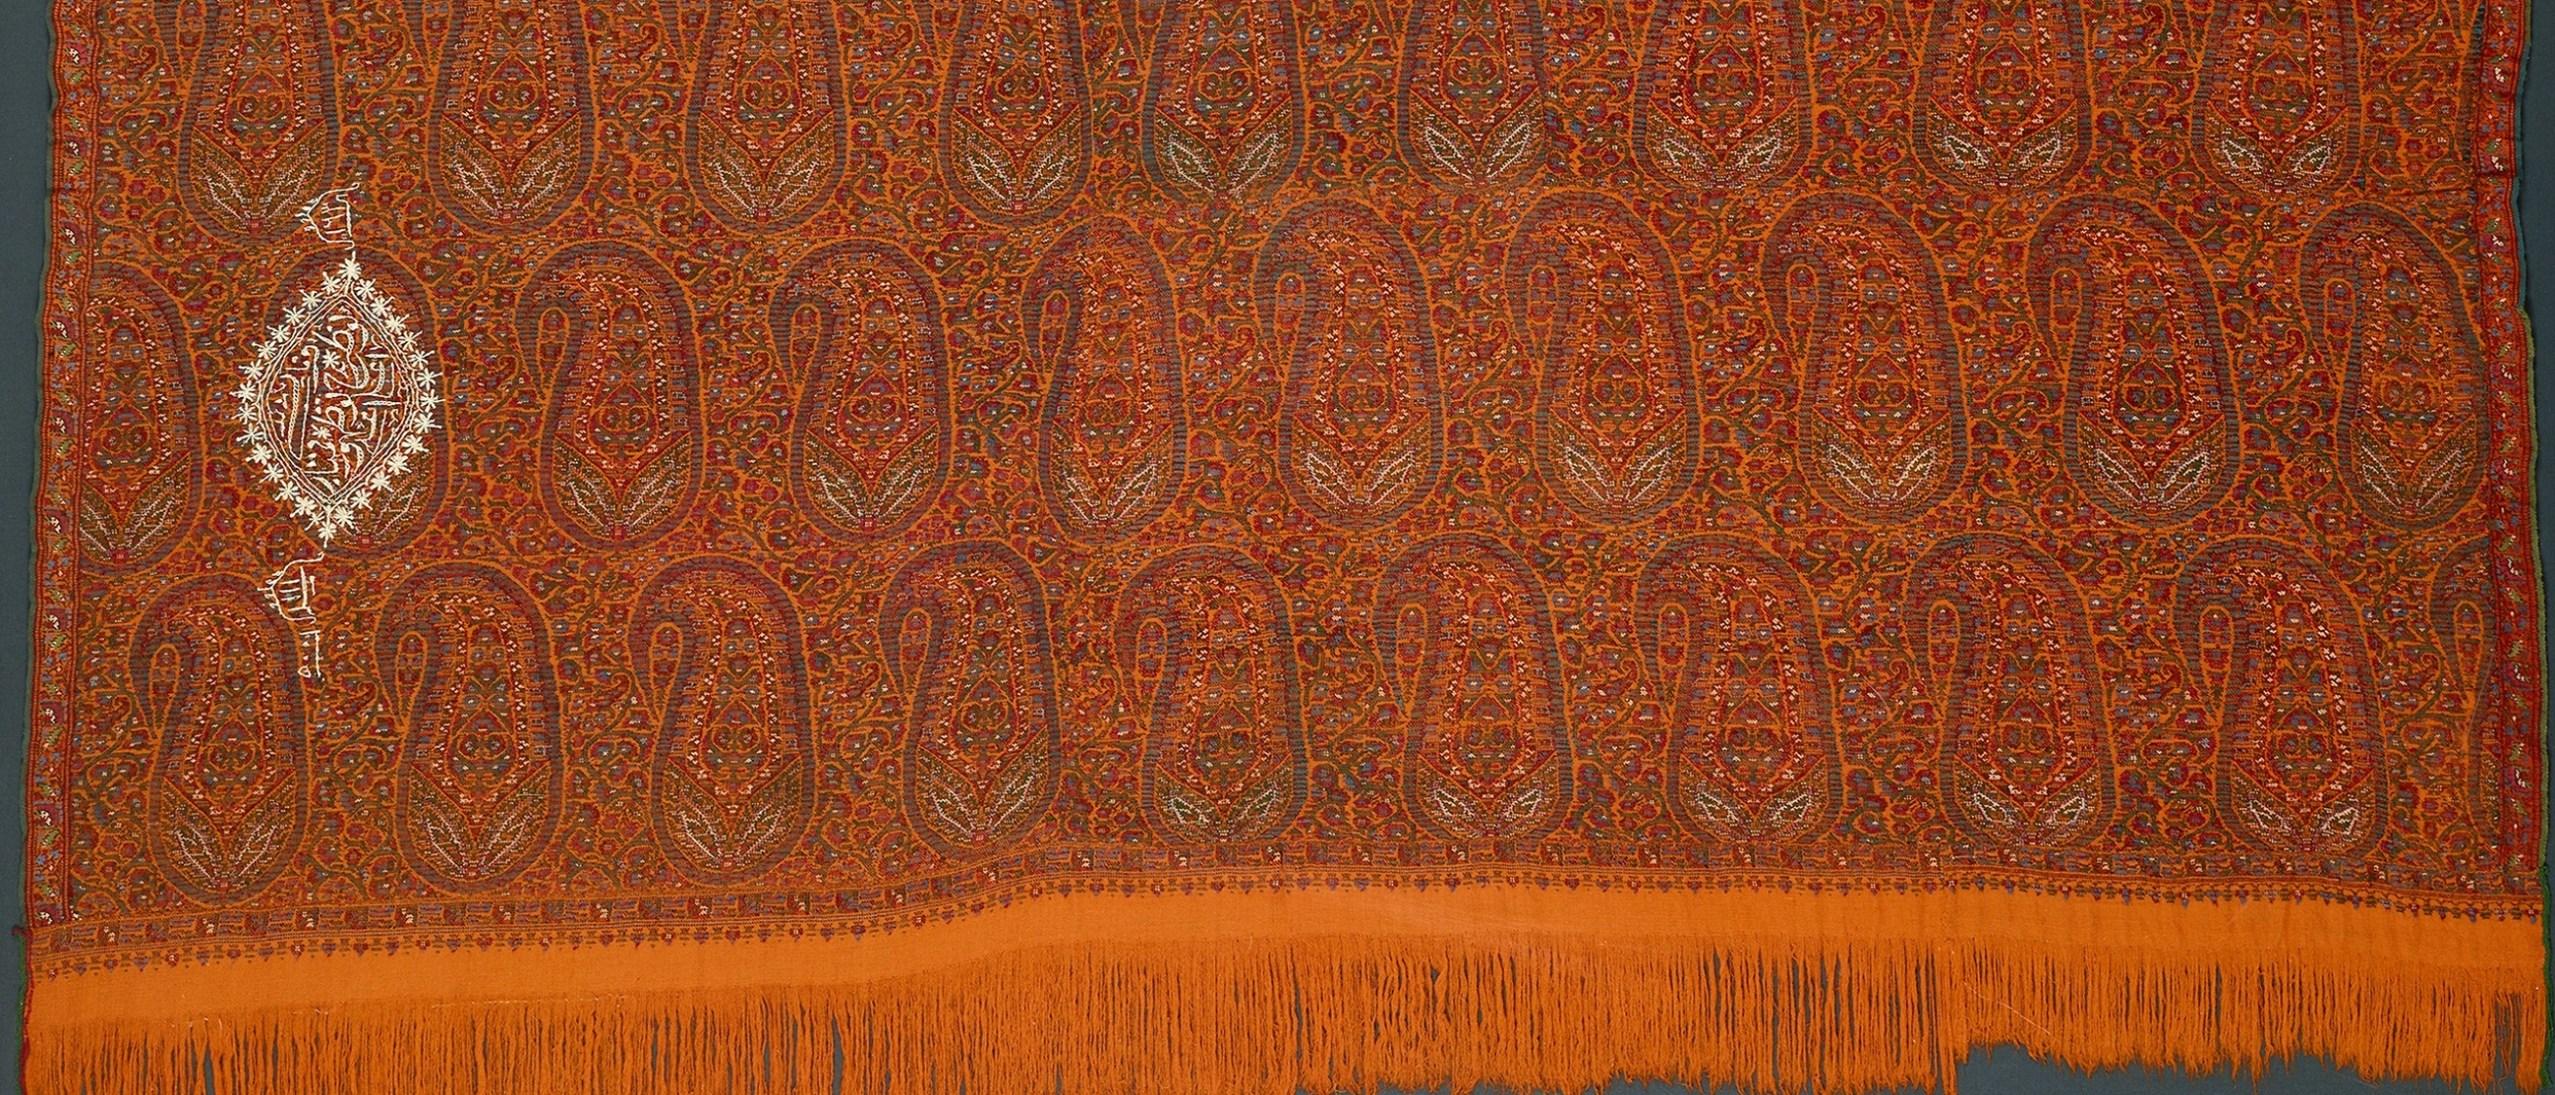 Detail photo of Textile (termeh cloth); Iran, probably Yazd, ca. 1875–1900; Wool and silk; 246 × 117 cm (96 7/8 × 46 1/16 in); Gift of Nader Ahari in memory of Nahid Ahari; Arthur M. Sackler Gallery S2017.14